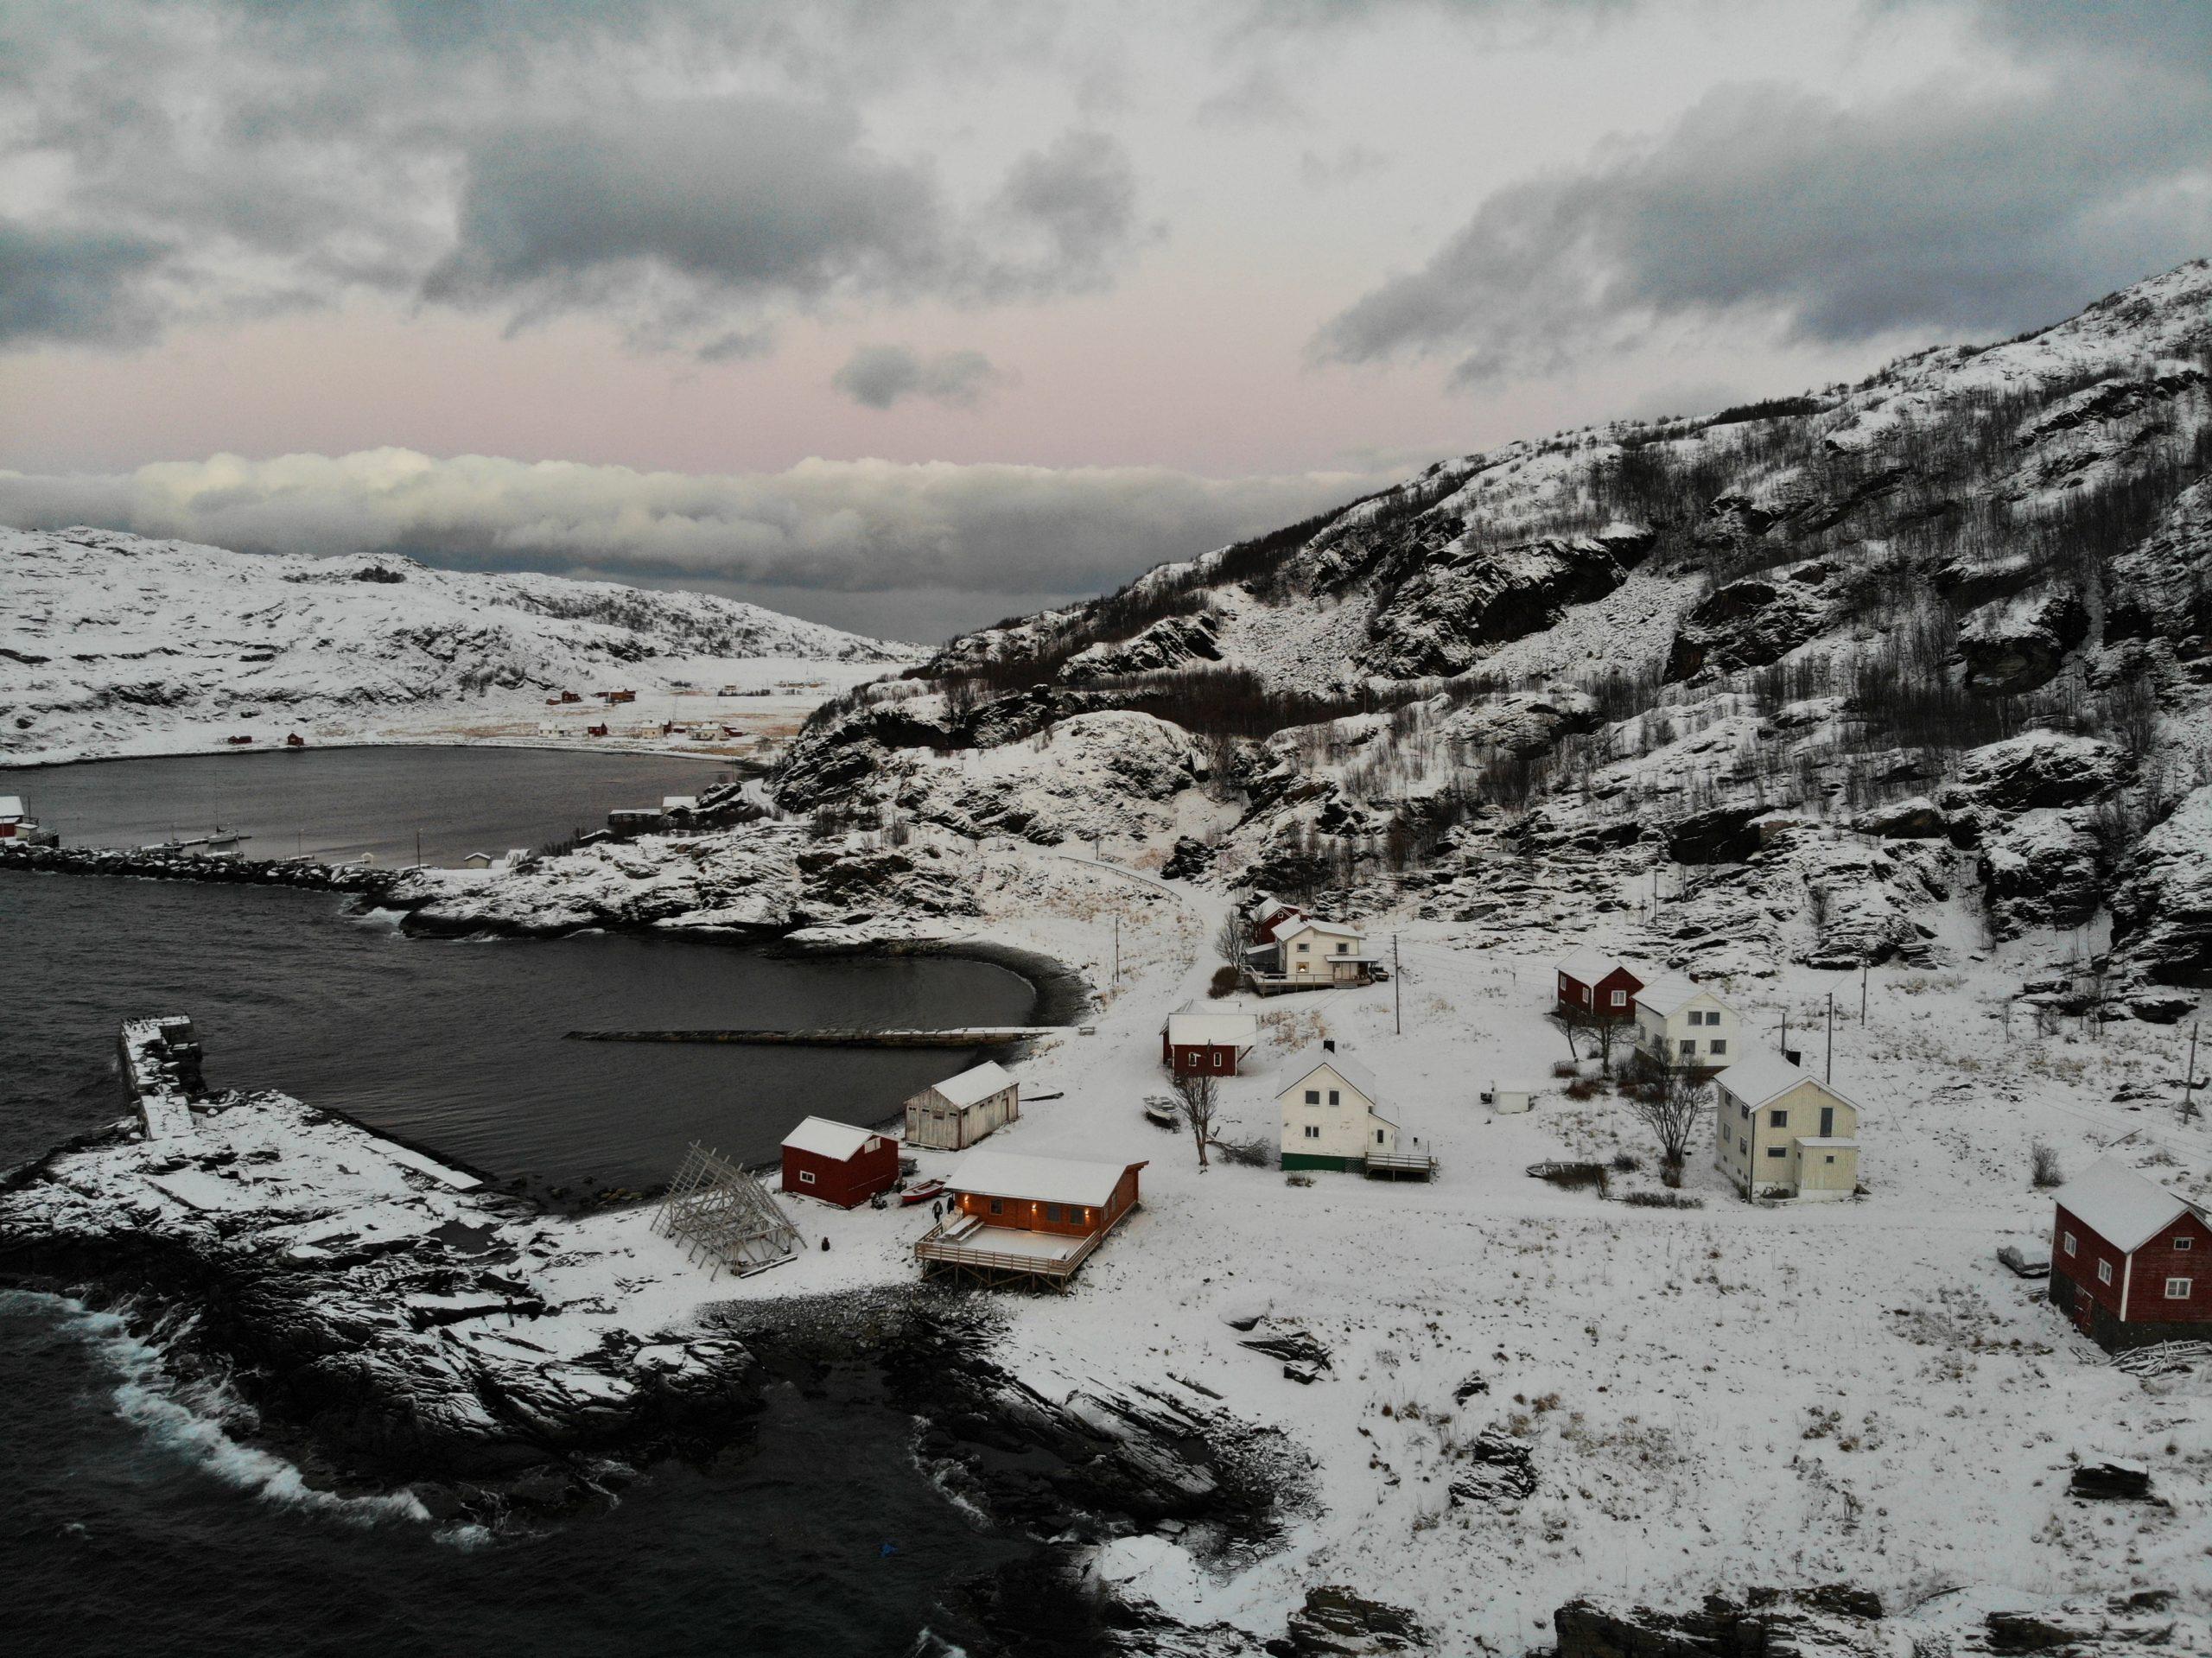 village norway drone snow mountains arctic